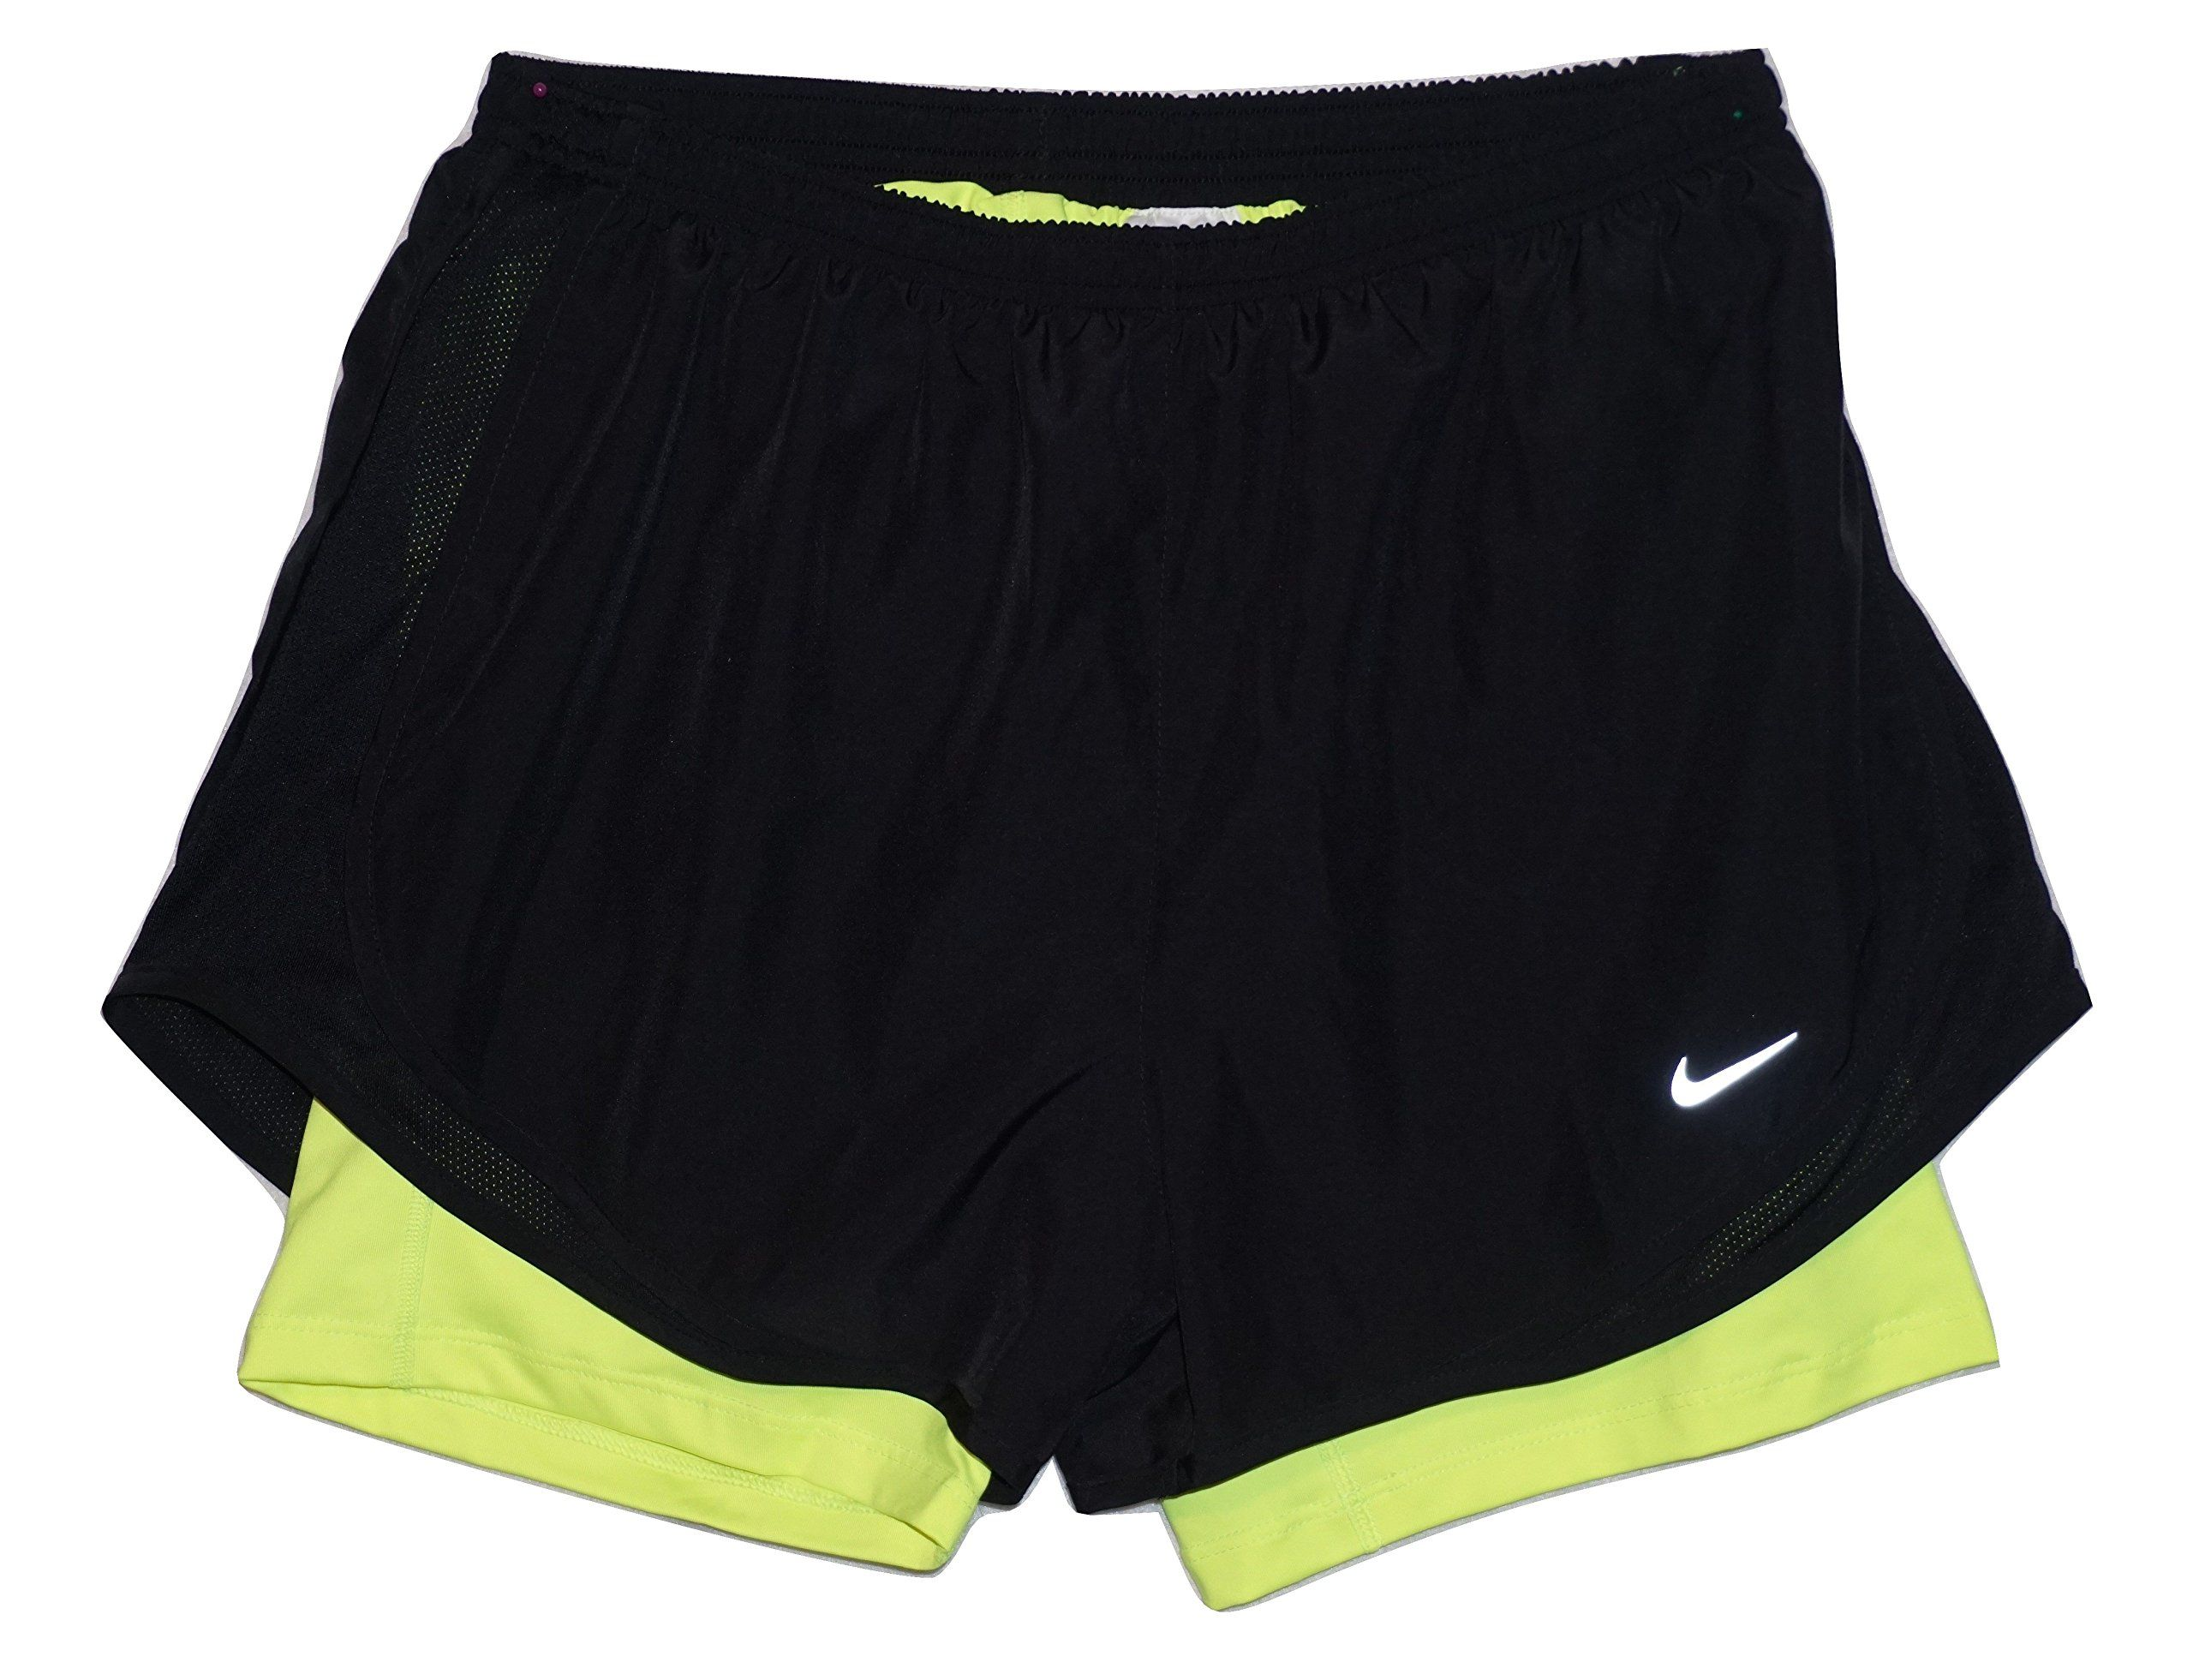 : NIKE Flex 2 in 1 3 Running Shorts Womens